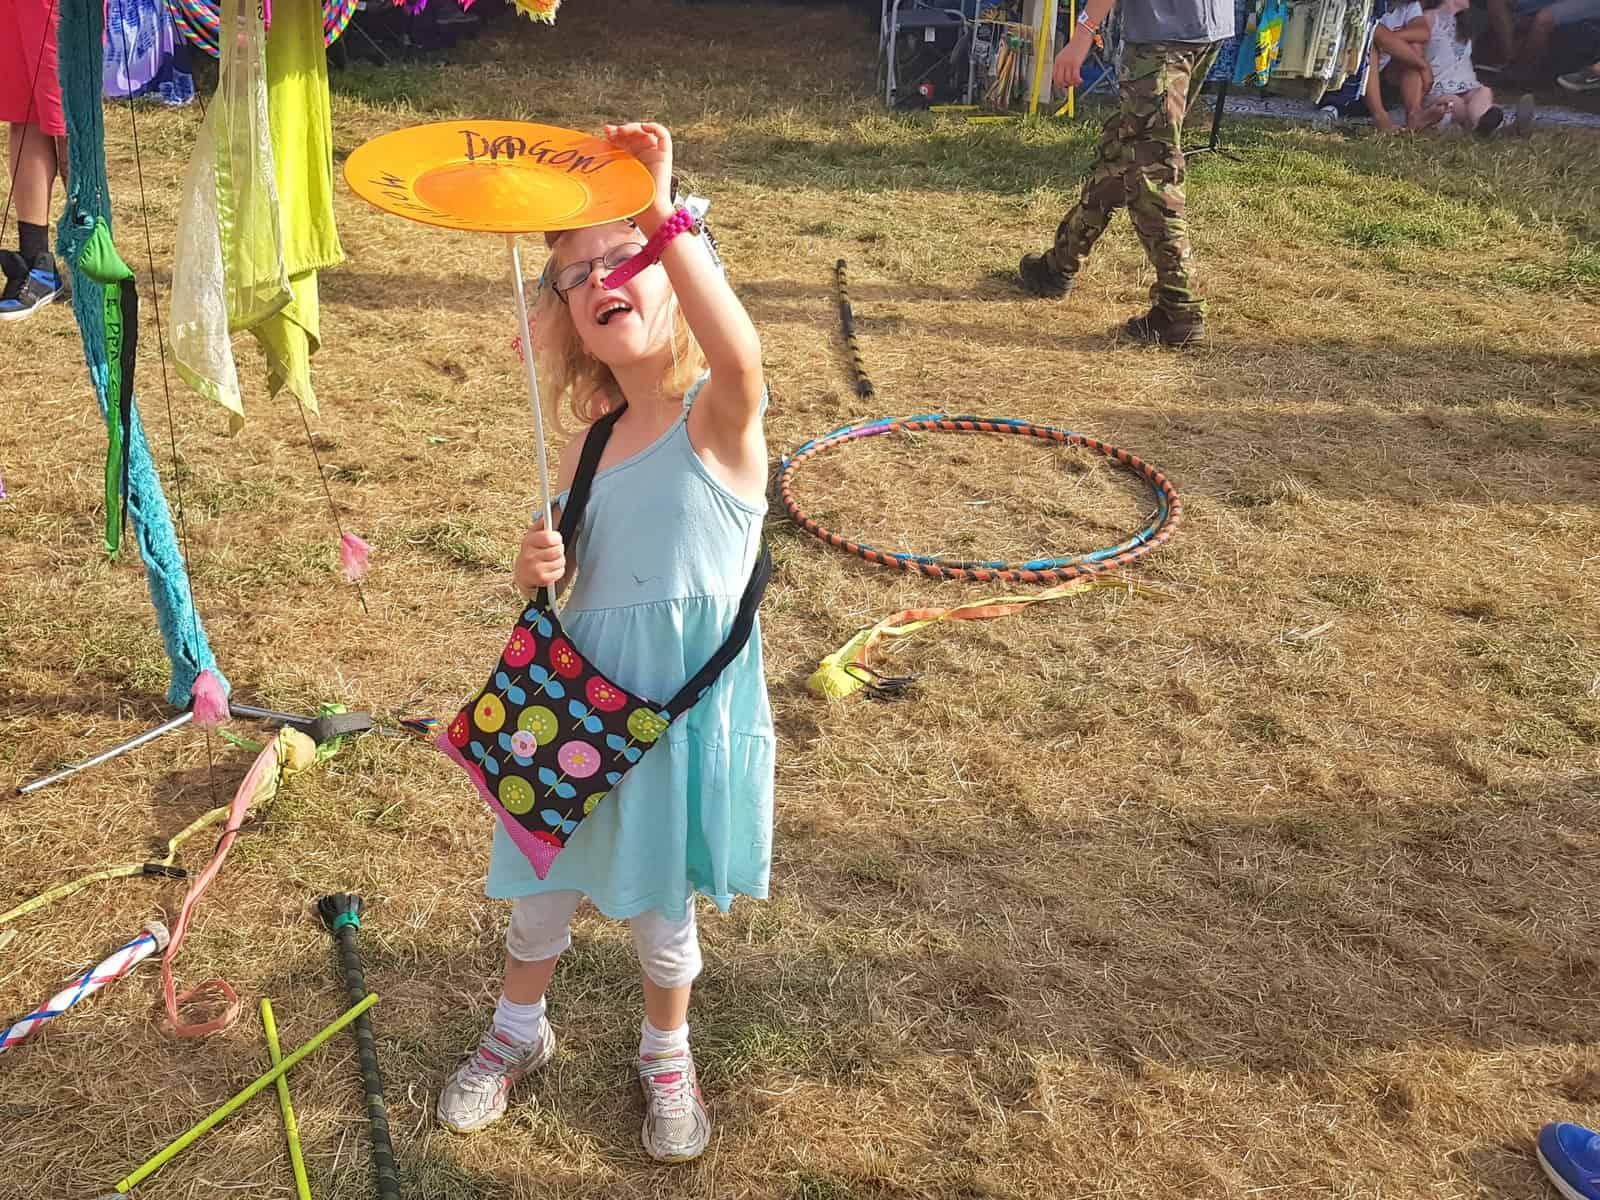 Nozstock the hidden valley festival - girl spinning plate